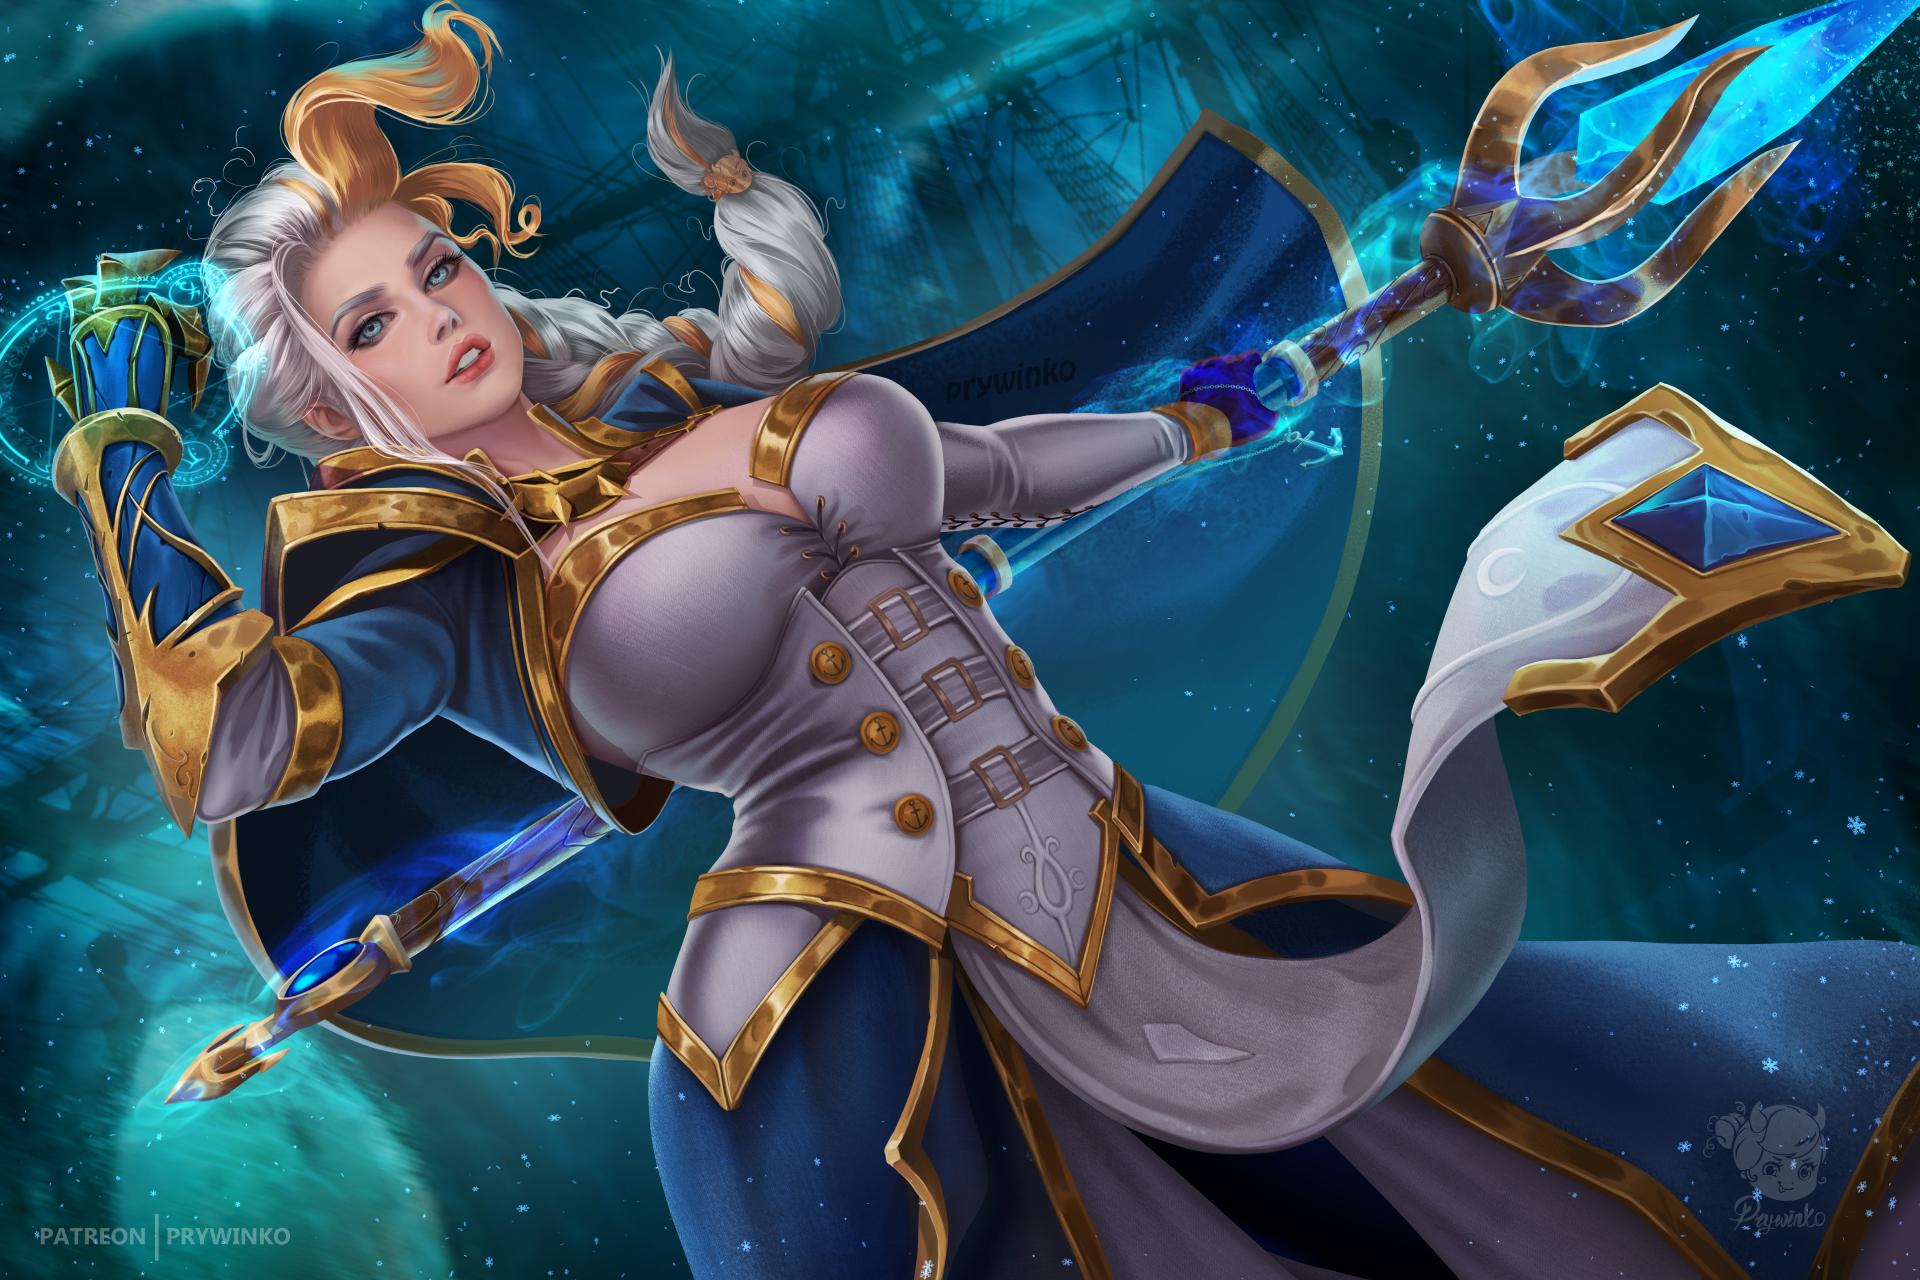 General 1920x1280 Prywinko artwork women staff female warrior Warcraft Jaina Proudmoore